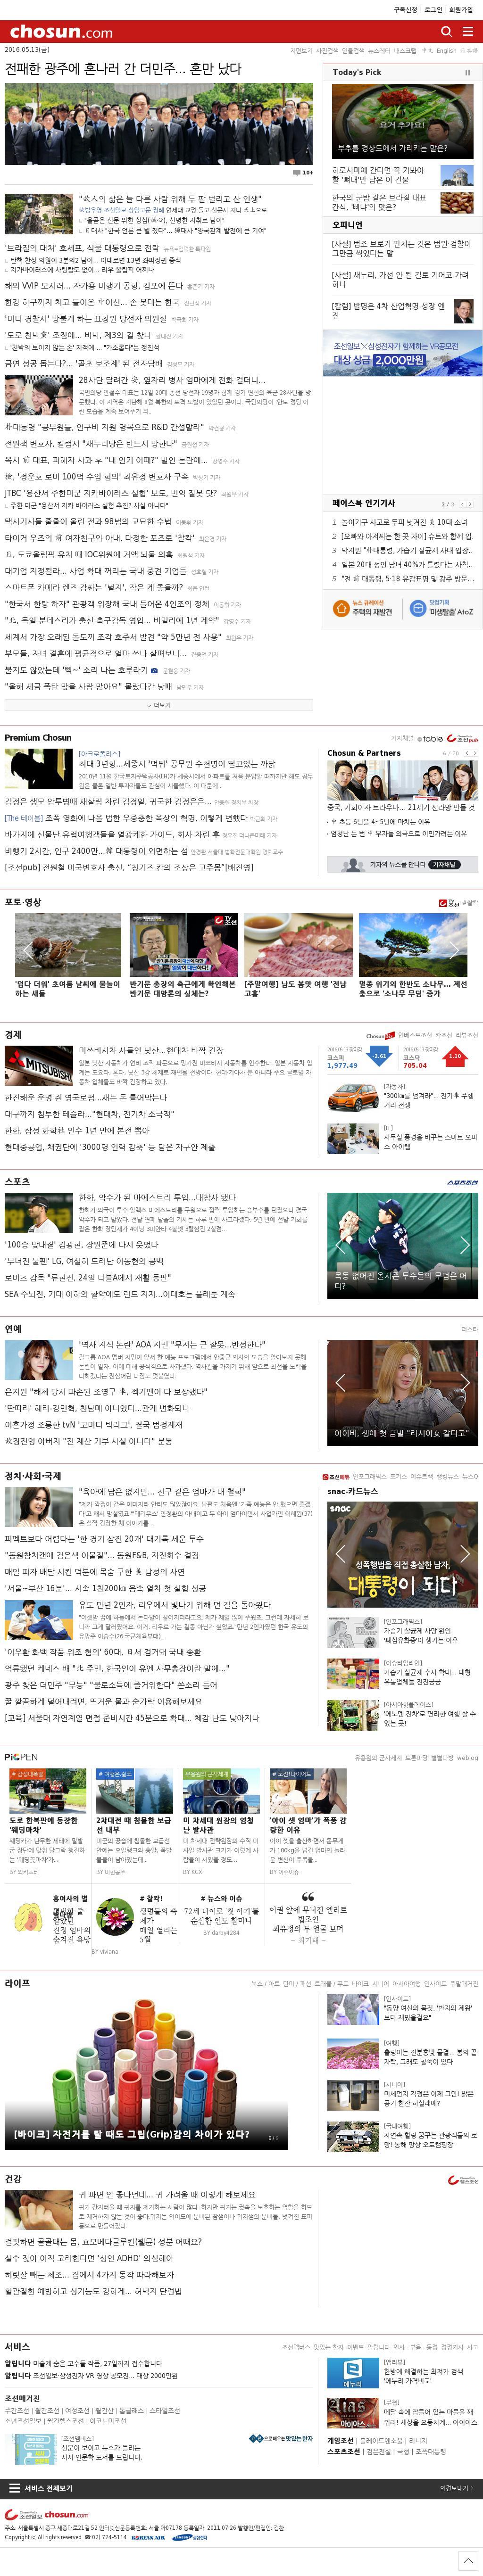 chosun.com at Thursday May 12, 2016, 10:02 p.m. UTC